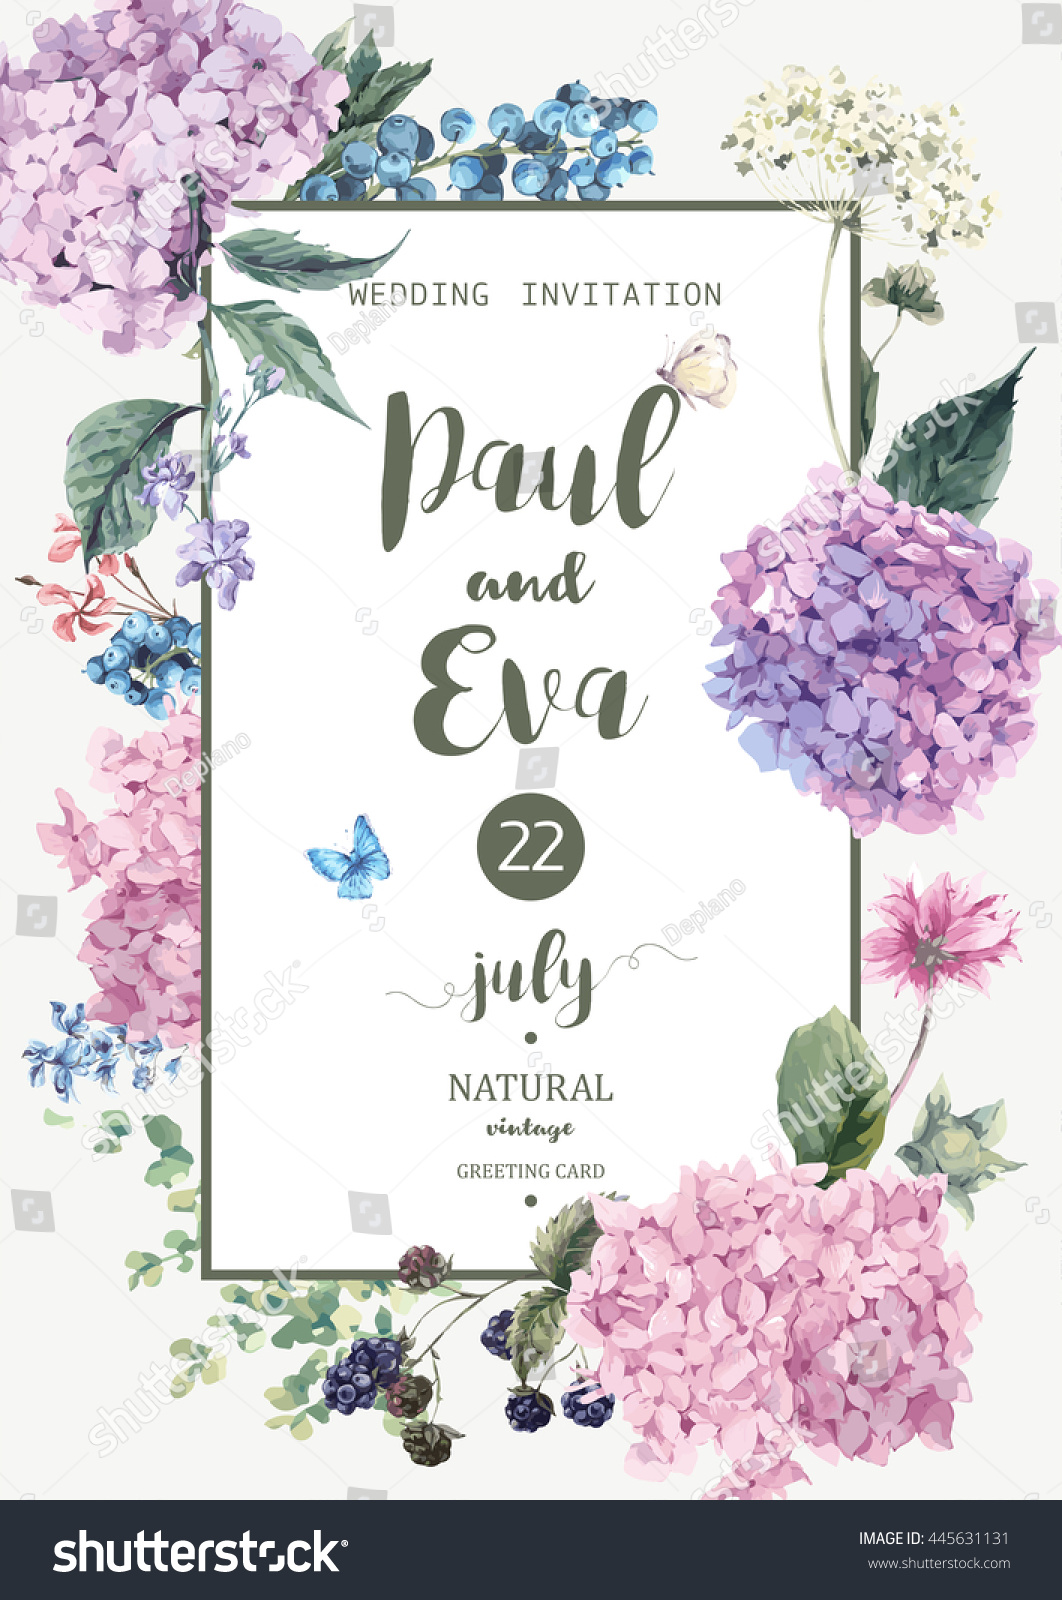 Vintage Floral Wedding Invitation Blooming Hydrangea Stock ...